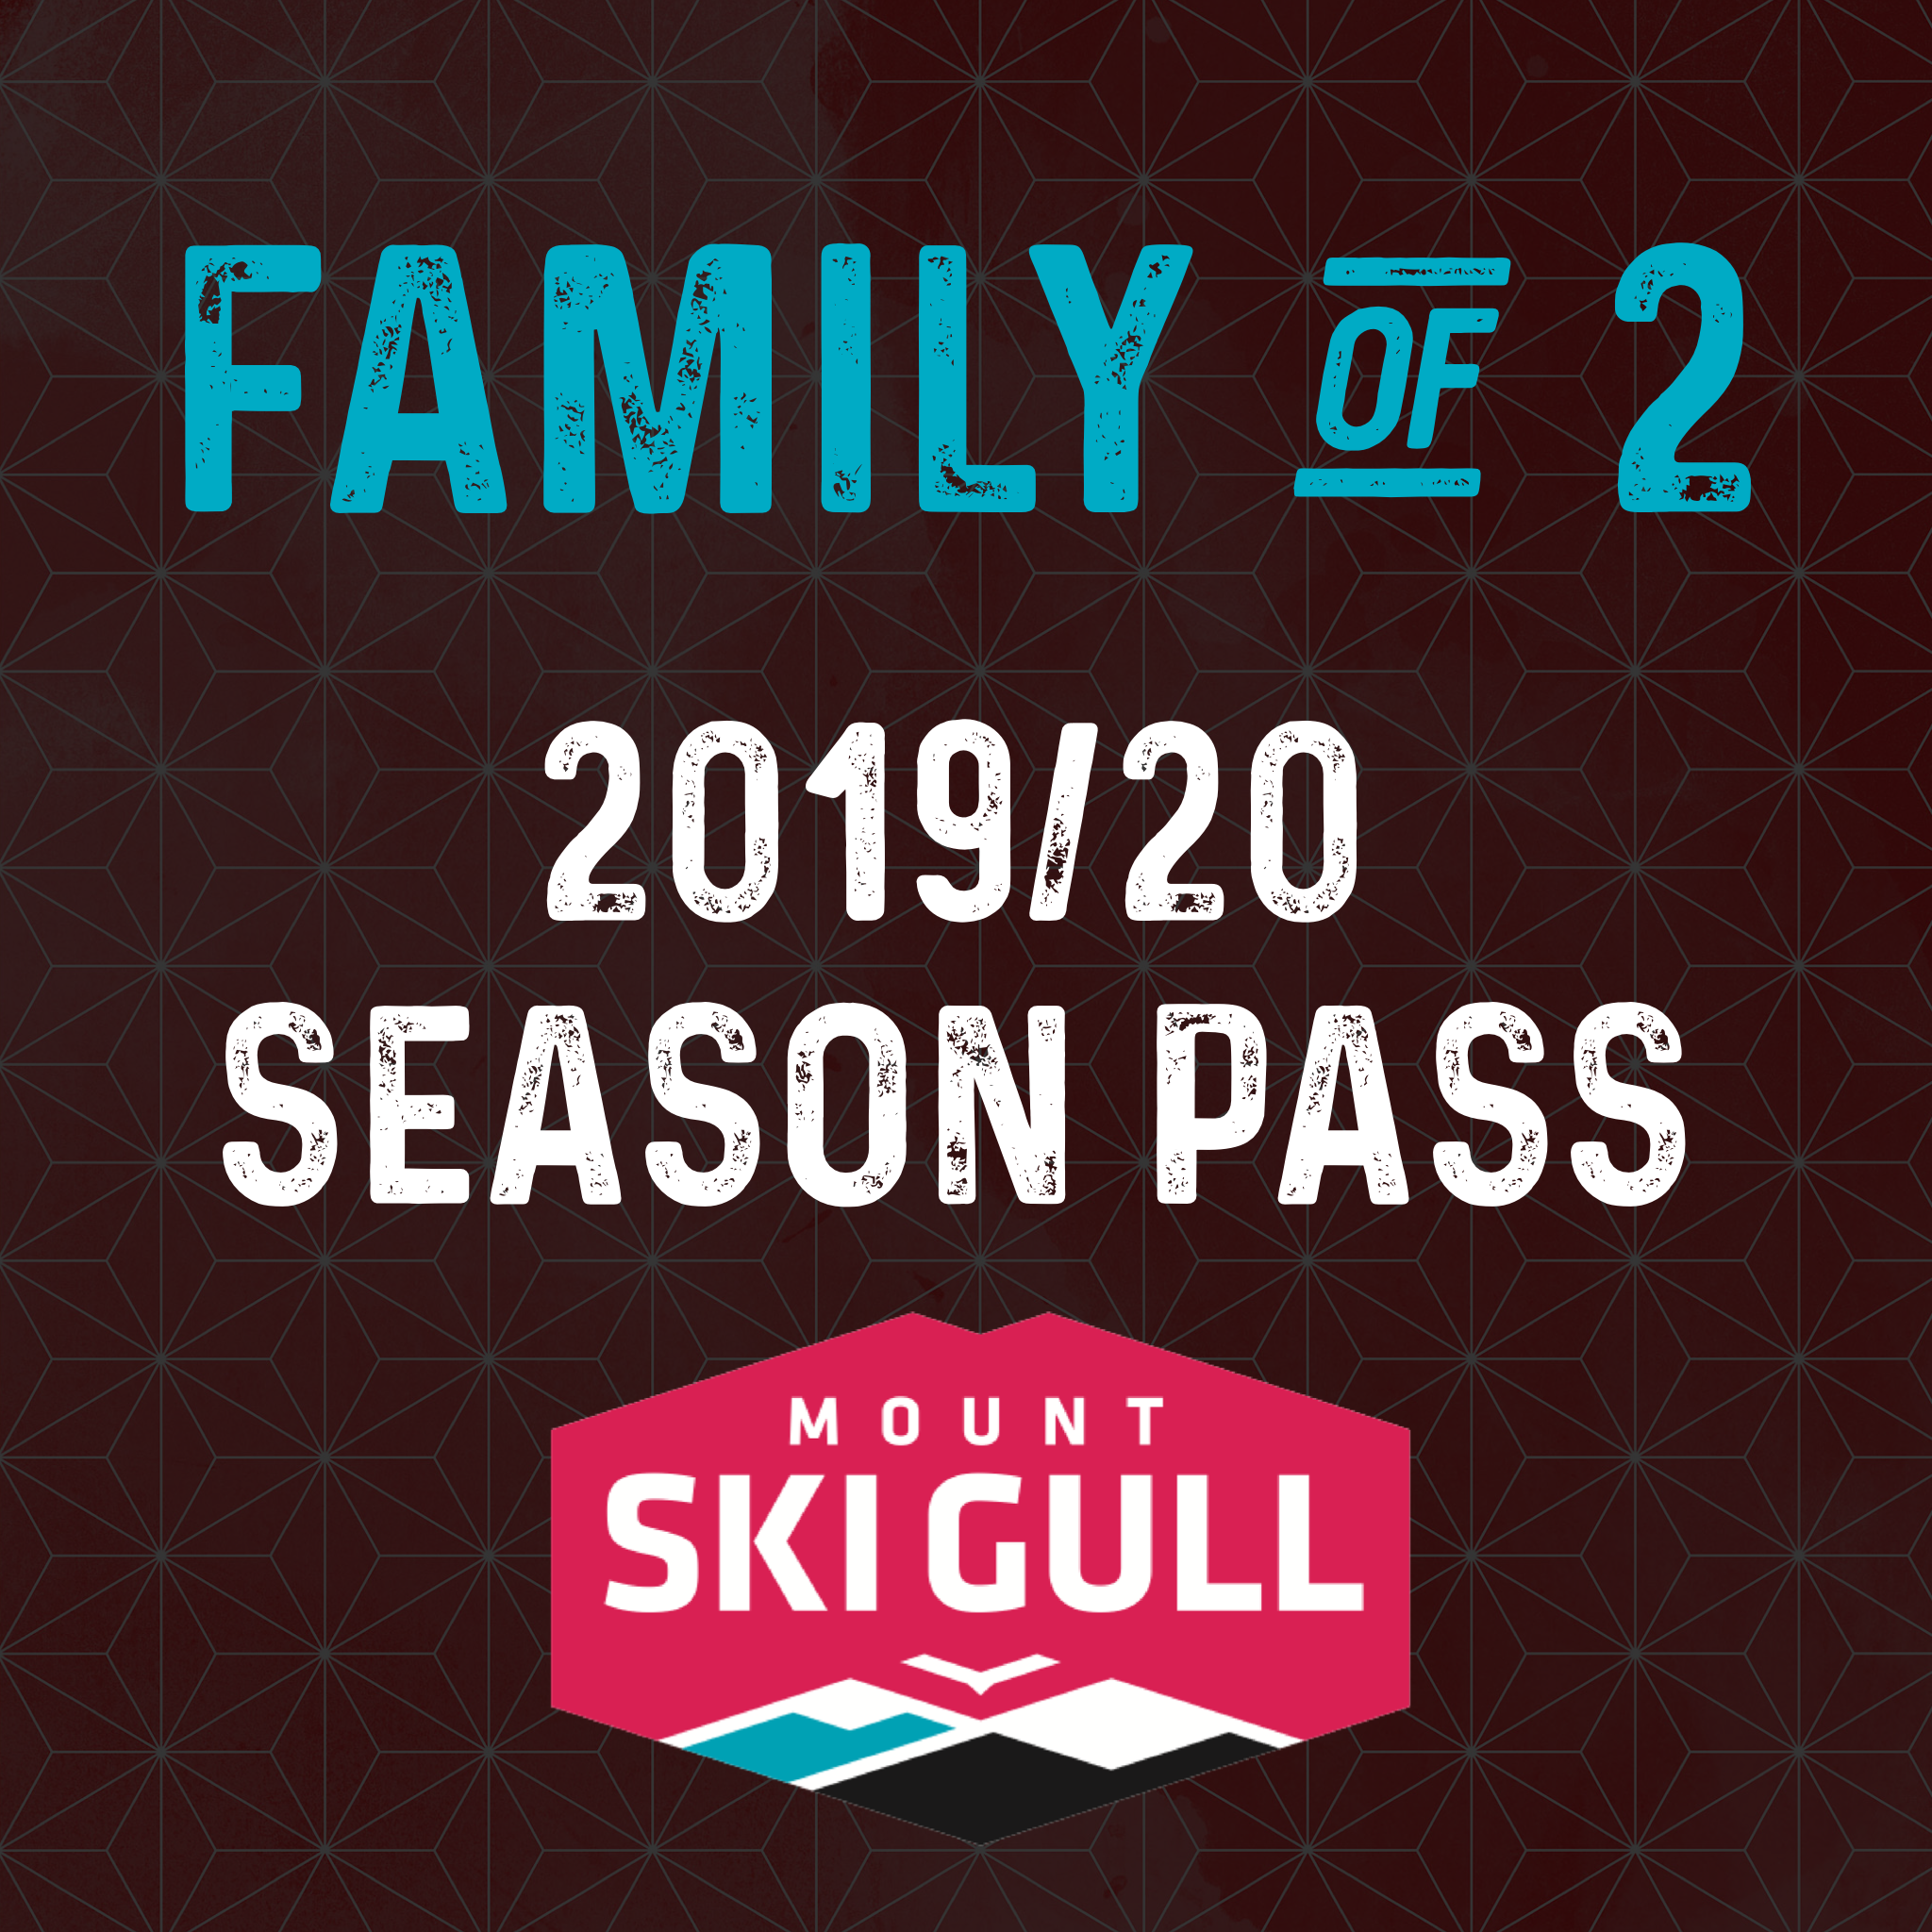 2019/20 Family of 2 Season Pass